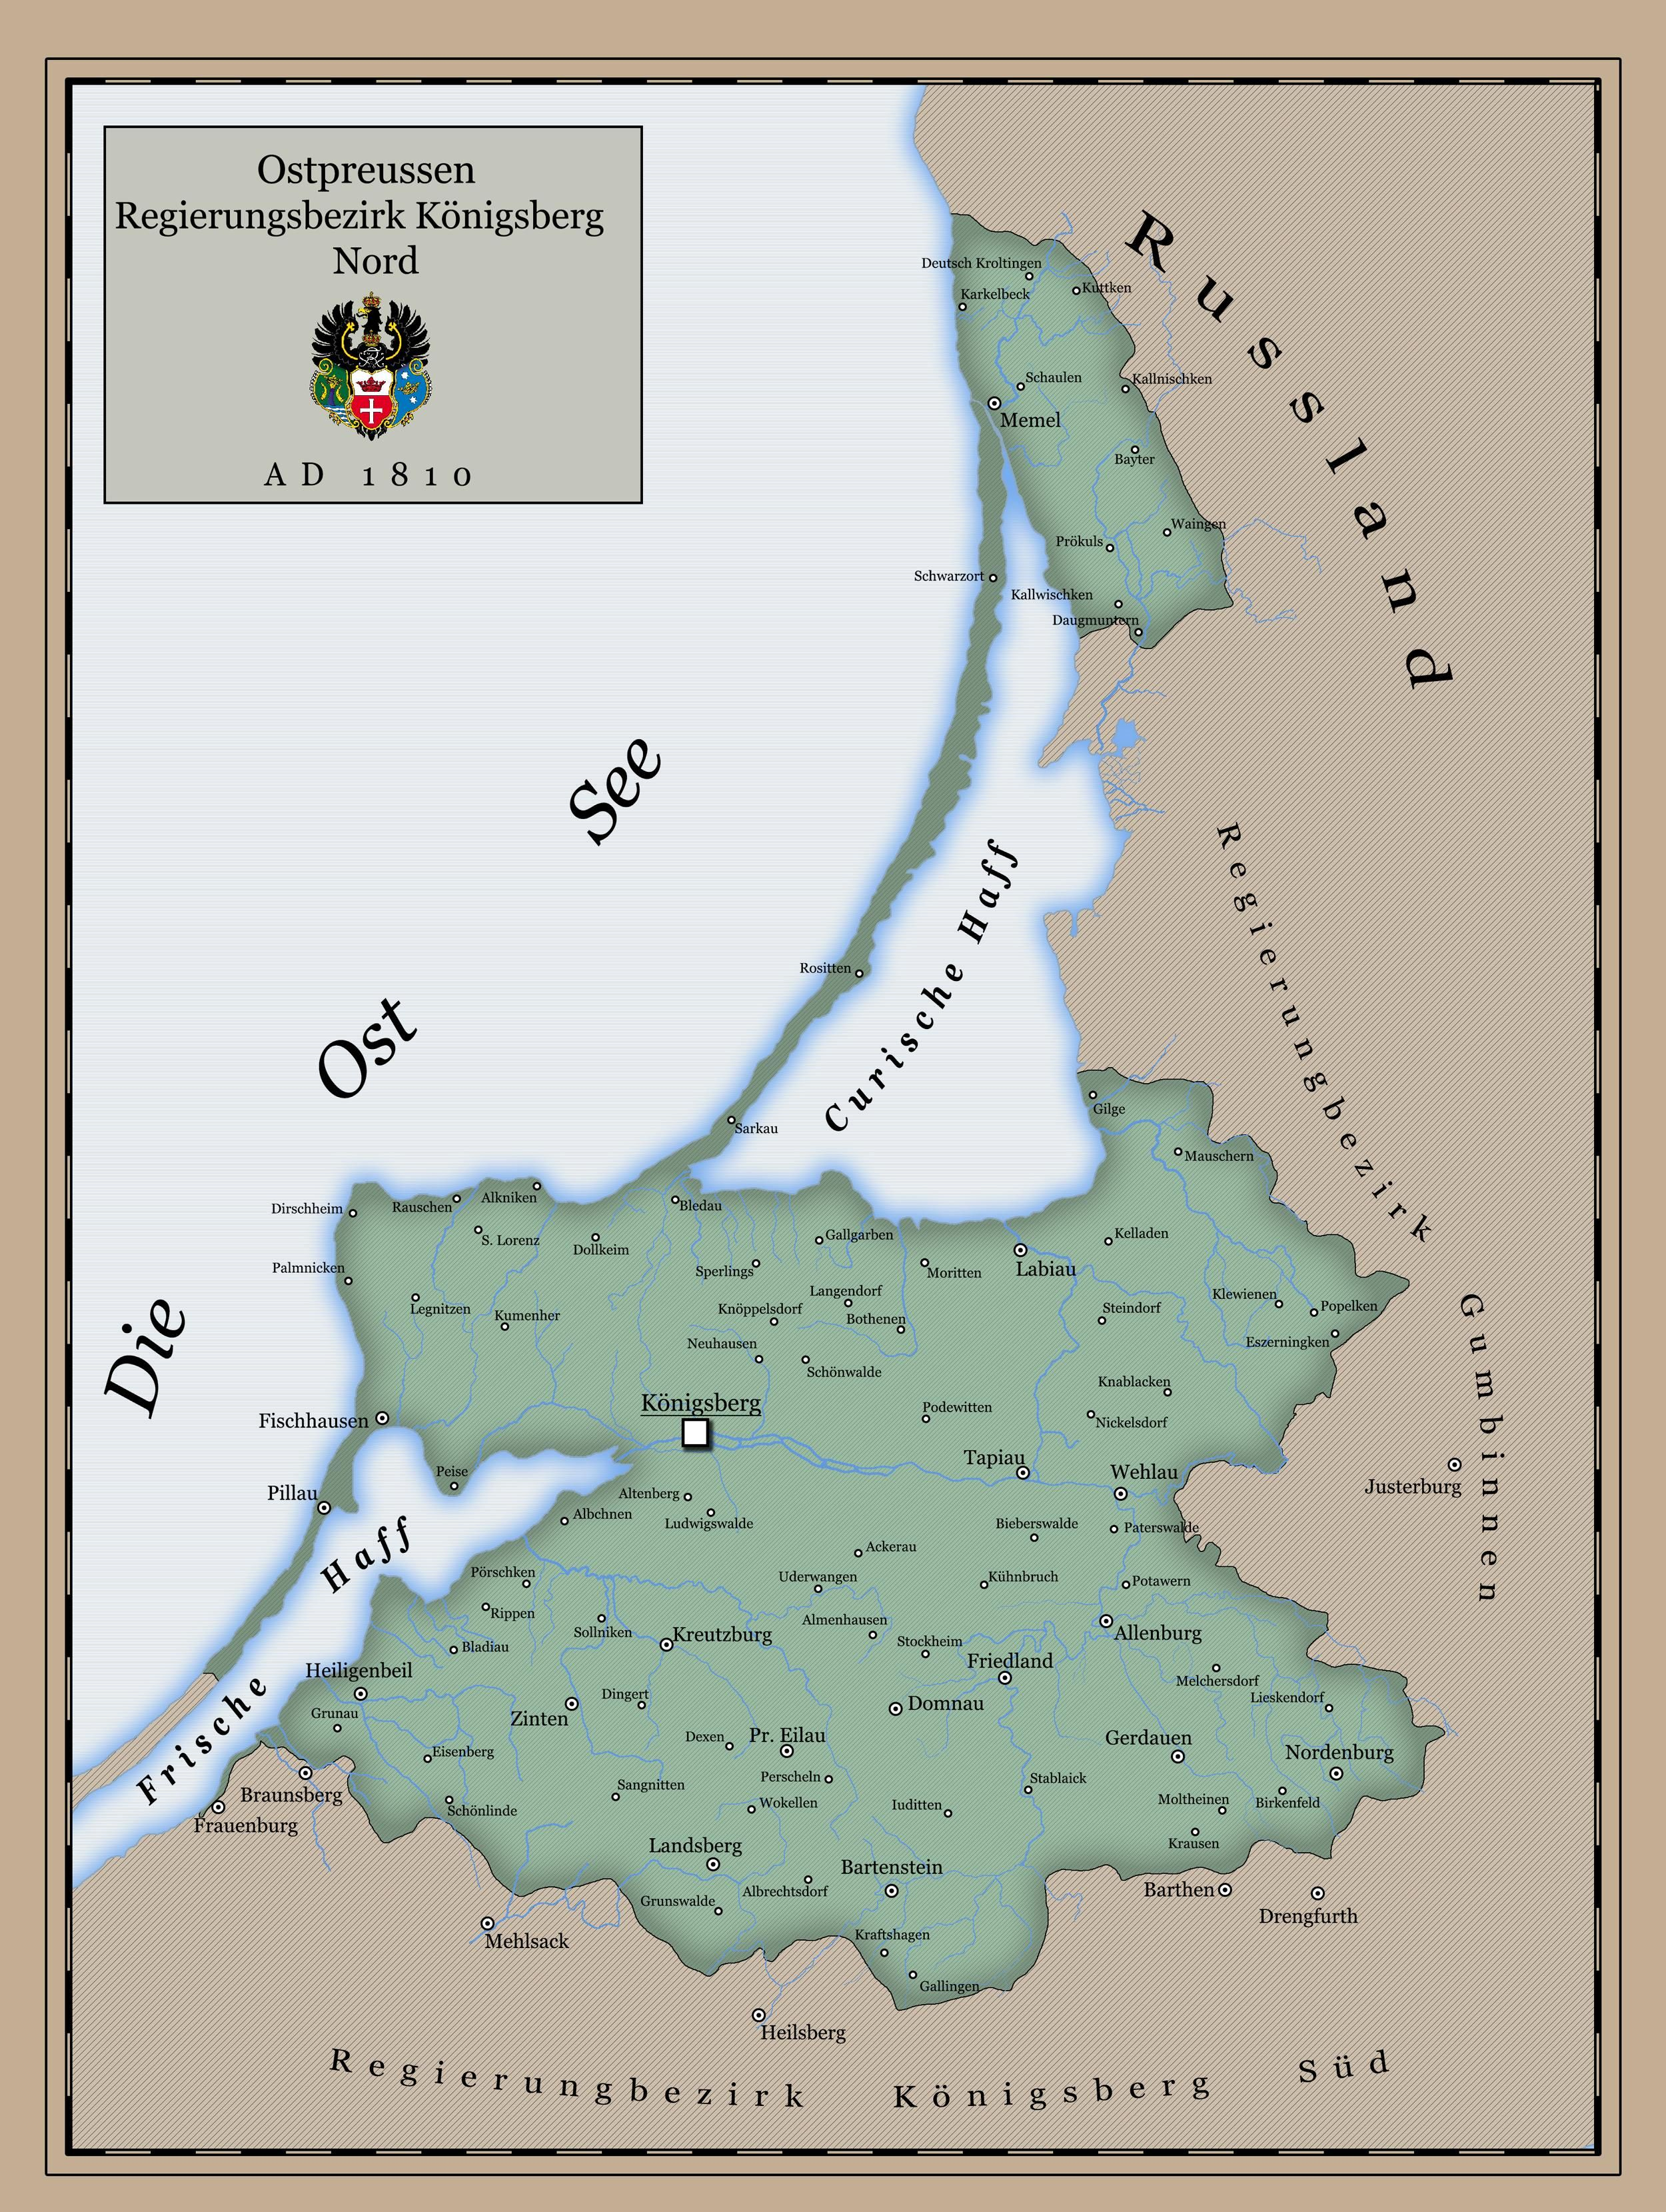 Ostpreussen,Regierungsbezirk Koenigsberg Nord 1810 | Places I'd Like on wwii europe map, air force europe map, post world war i map, world at war map europe, world map changes over time, school europe map, japan europe map, gdansk europe map, world war i europe map, all countries labeled europe map, risk game europe map, d day europe map, world war 1 timeline of events, world war ii, world war 1914 europe map, afghanistan europe map, western front 1944 map, war war 2 map, war vietnam on world map, hundred years war europe map,